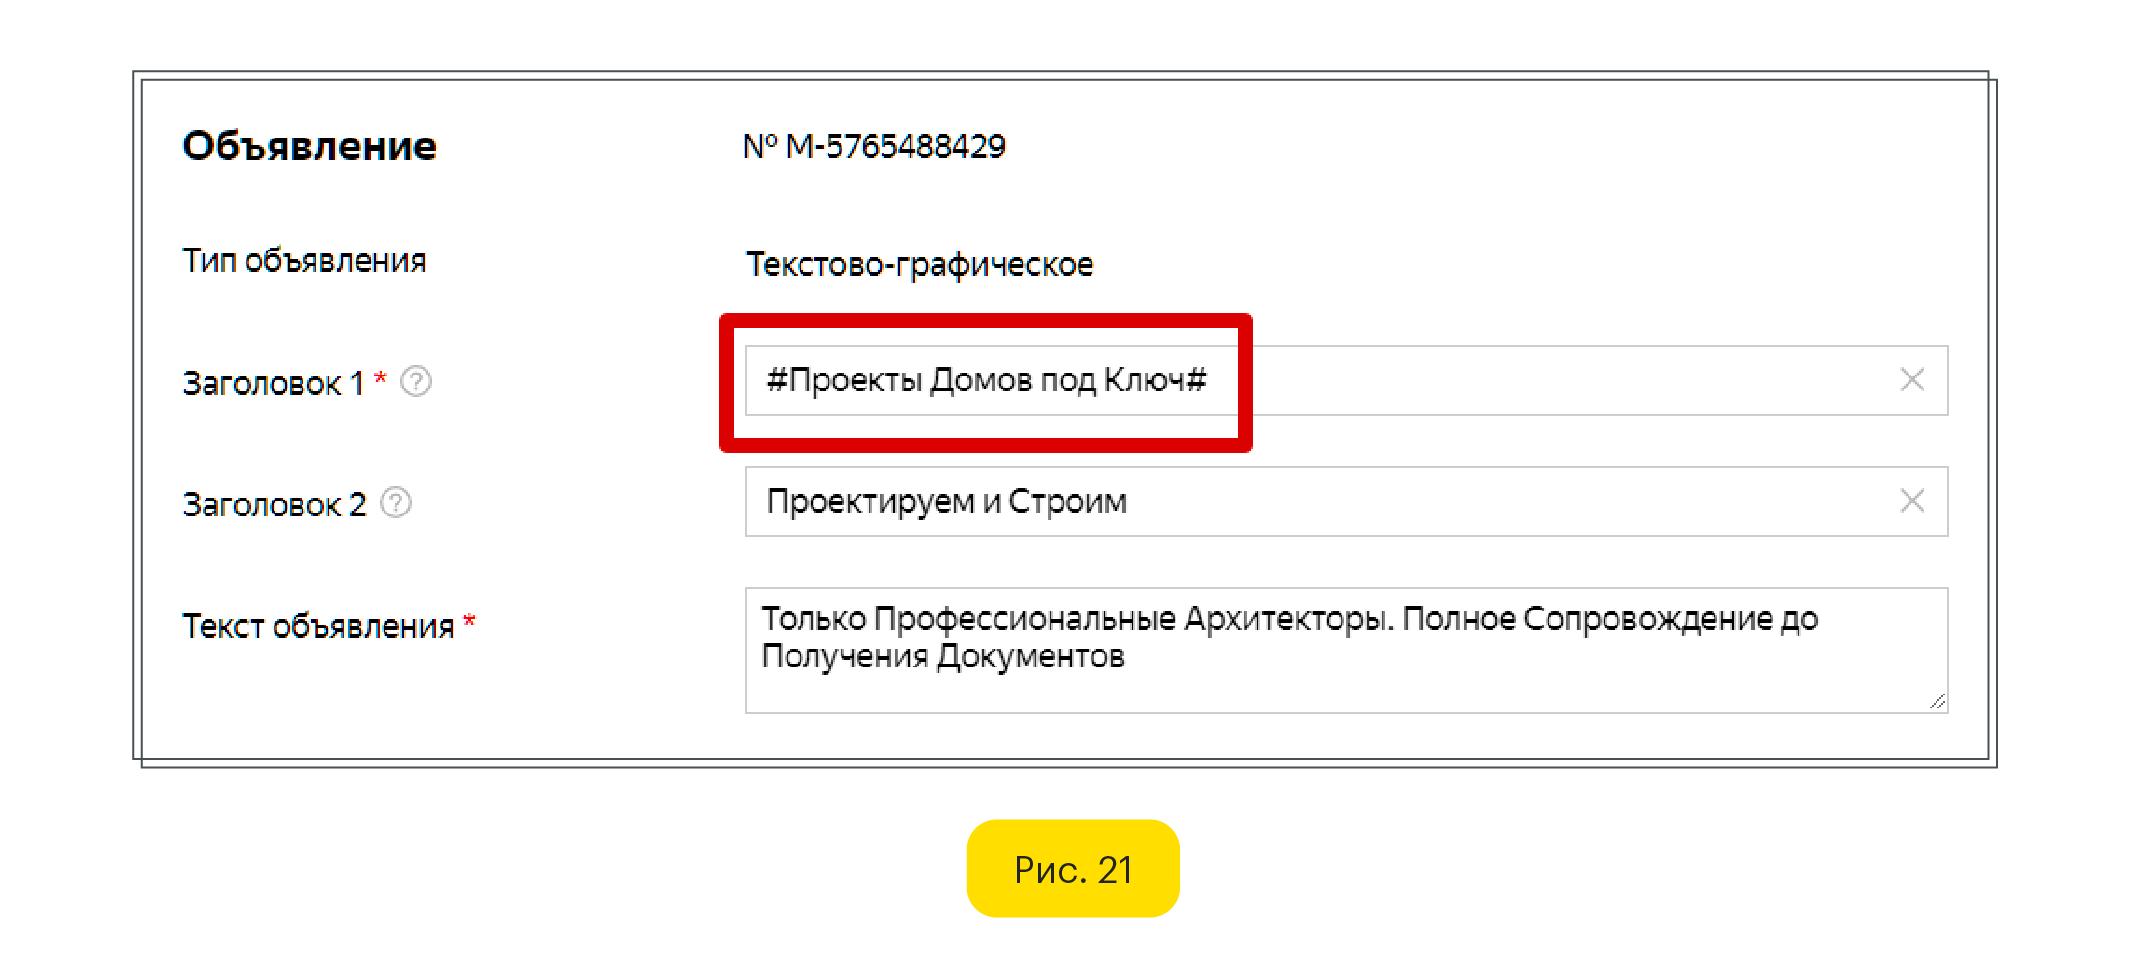 Объявление с шаблоном автоподстановки Яндекс Директ